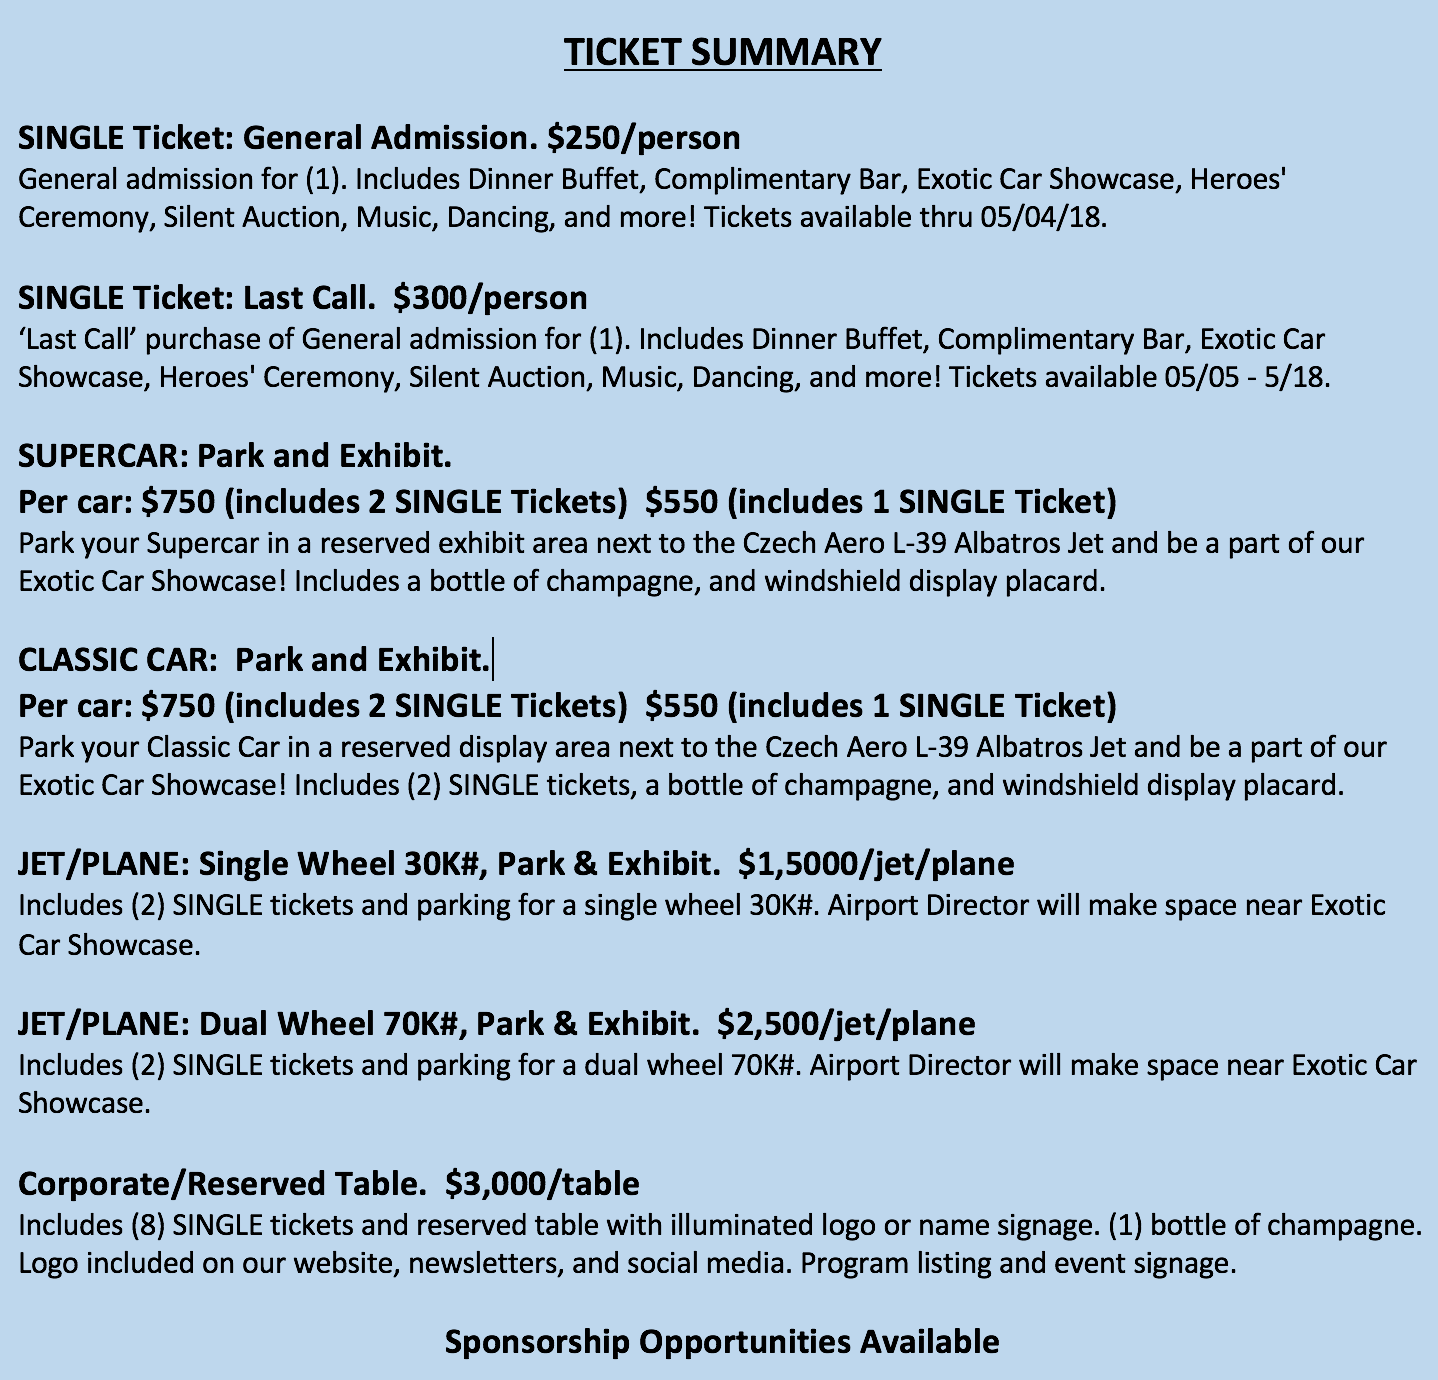 J&C Ticket Descritption